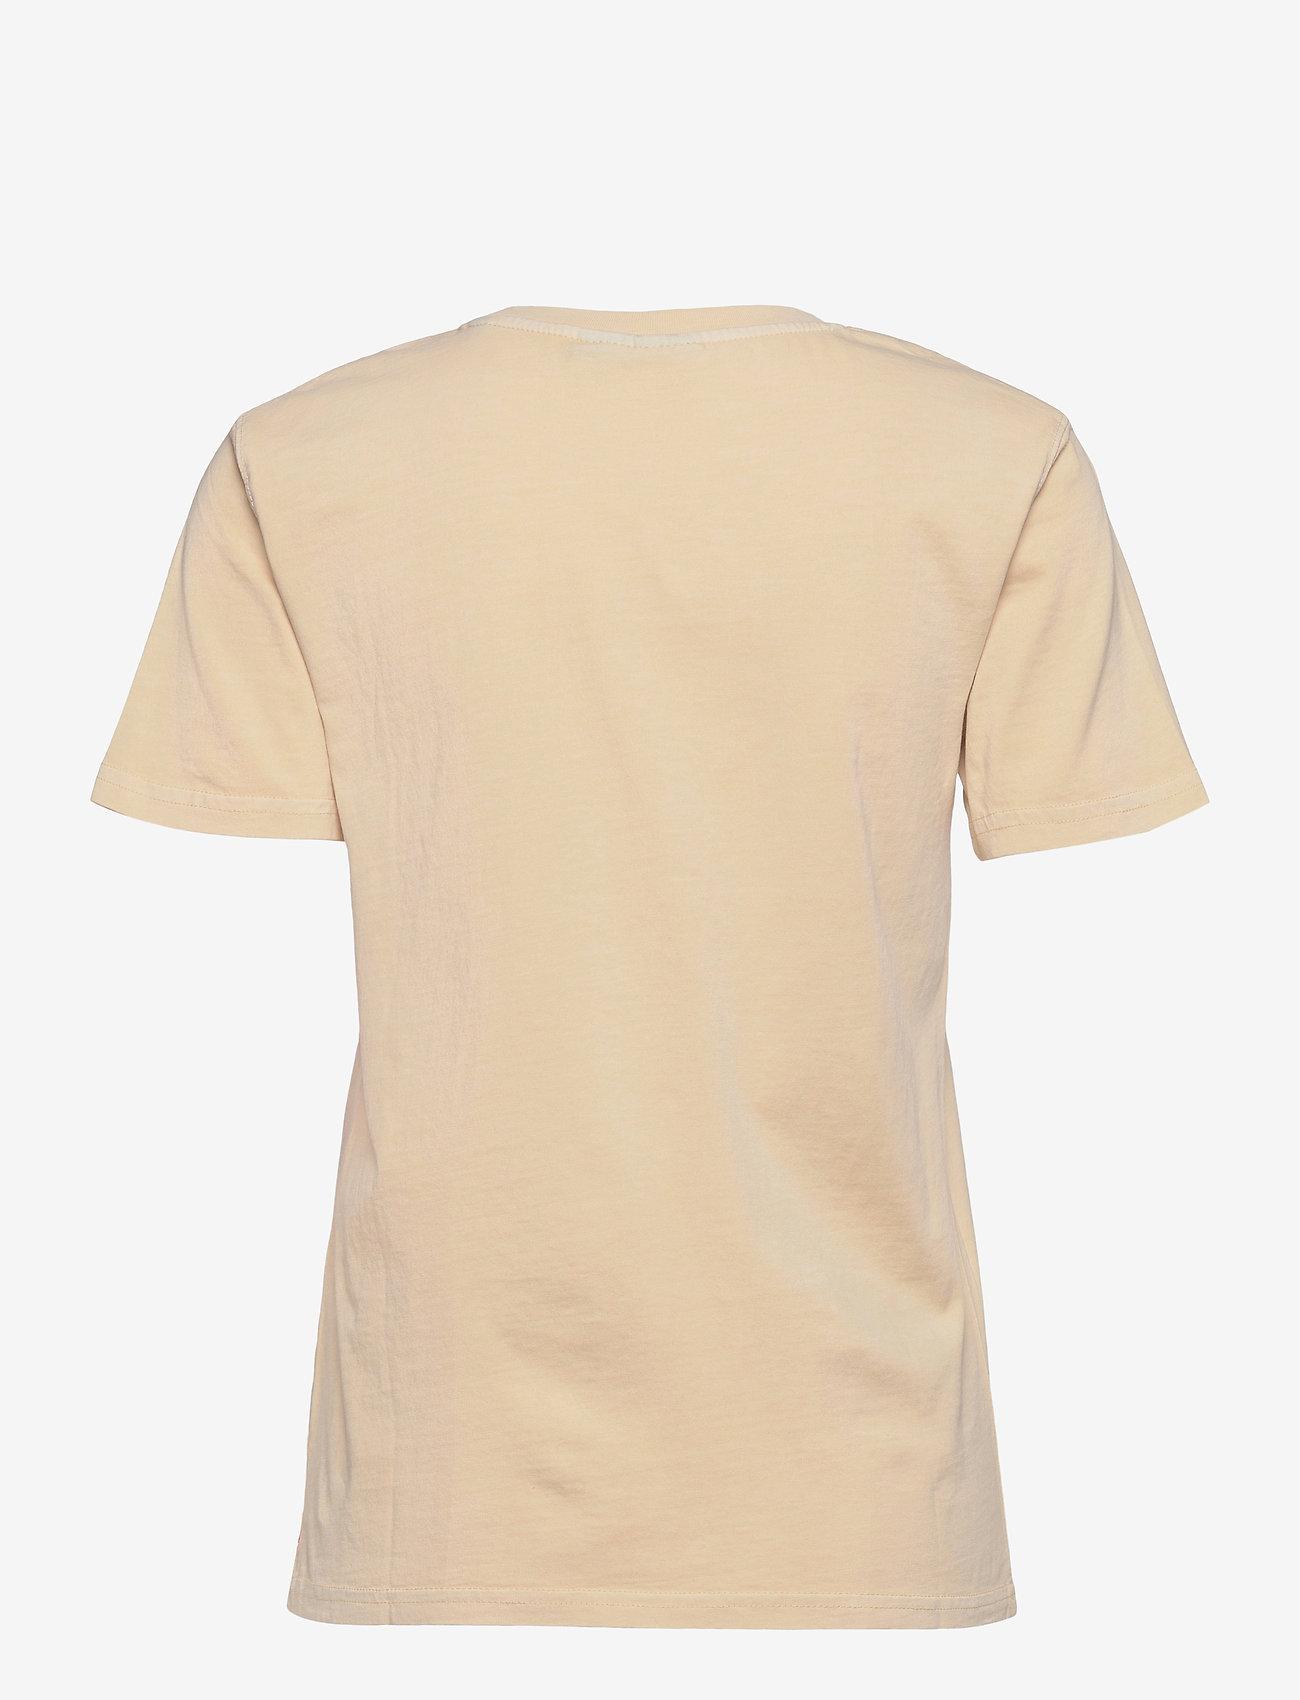 HAN Kjøbenhavn - Casual Tee - t-shirts - beige logo - 1